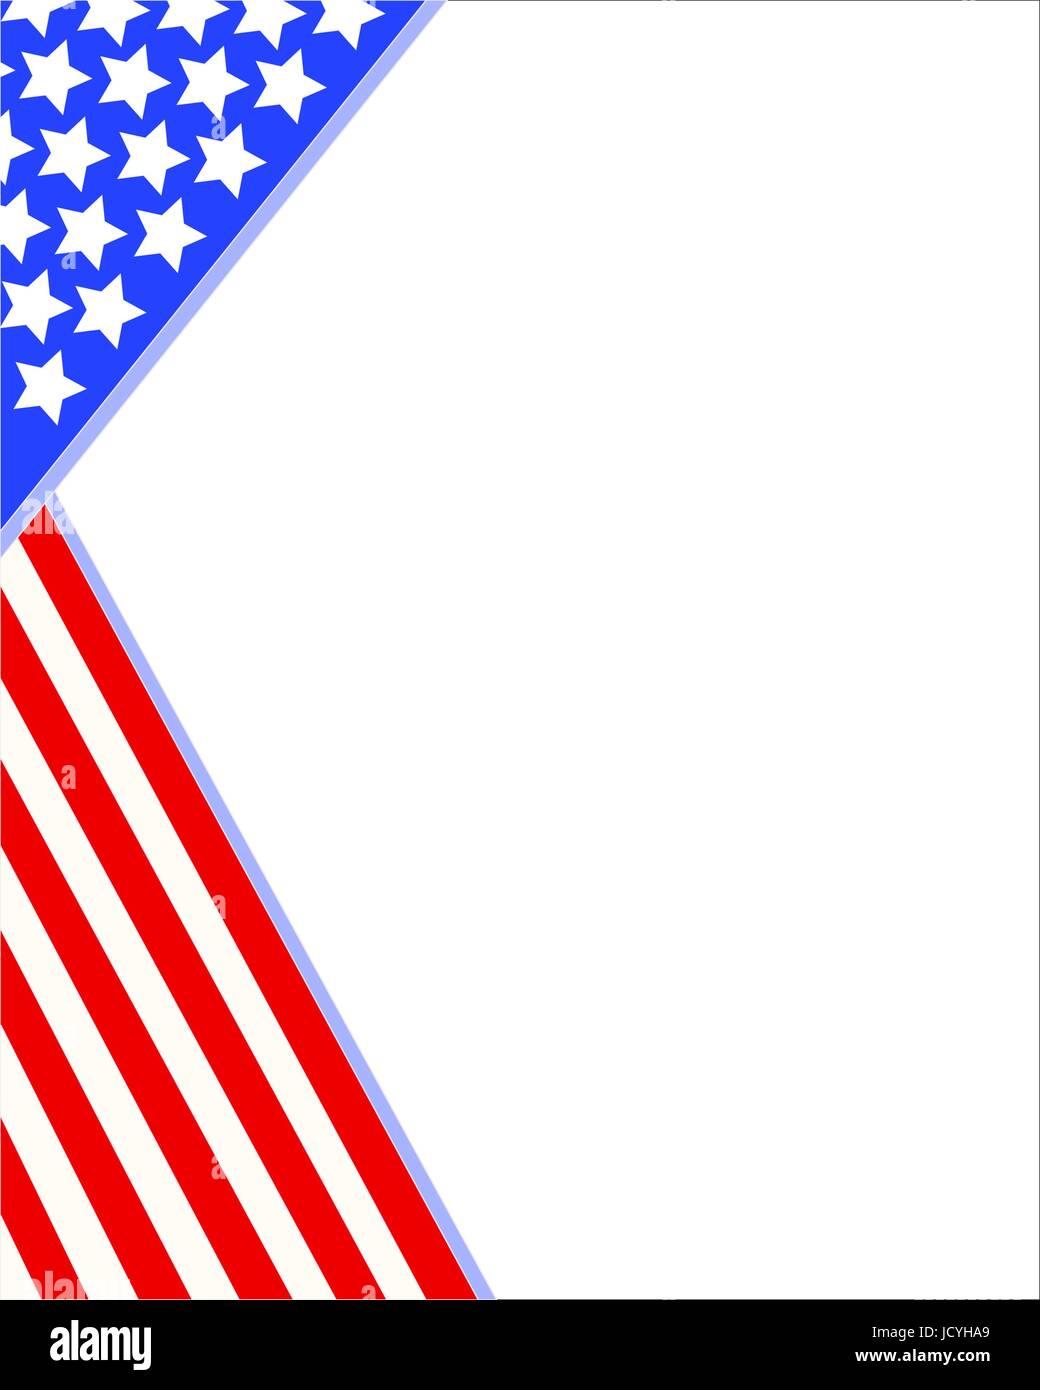 Us Flag Patriotic Border Template Stockfotos & Us Flag Patriotic ...